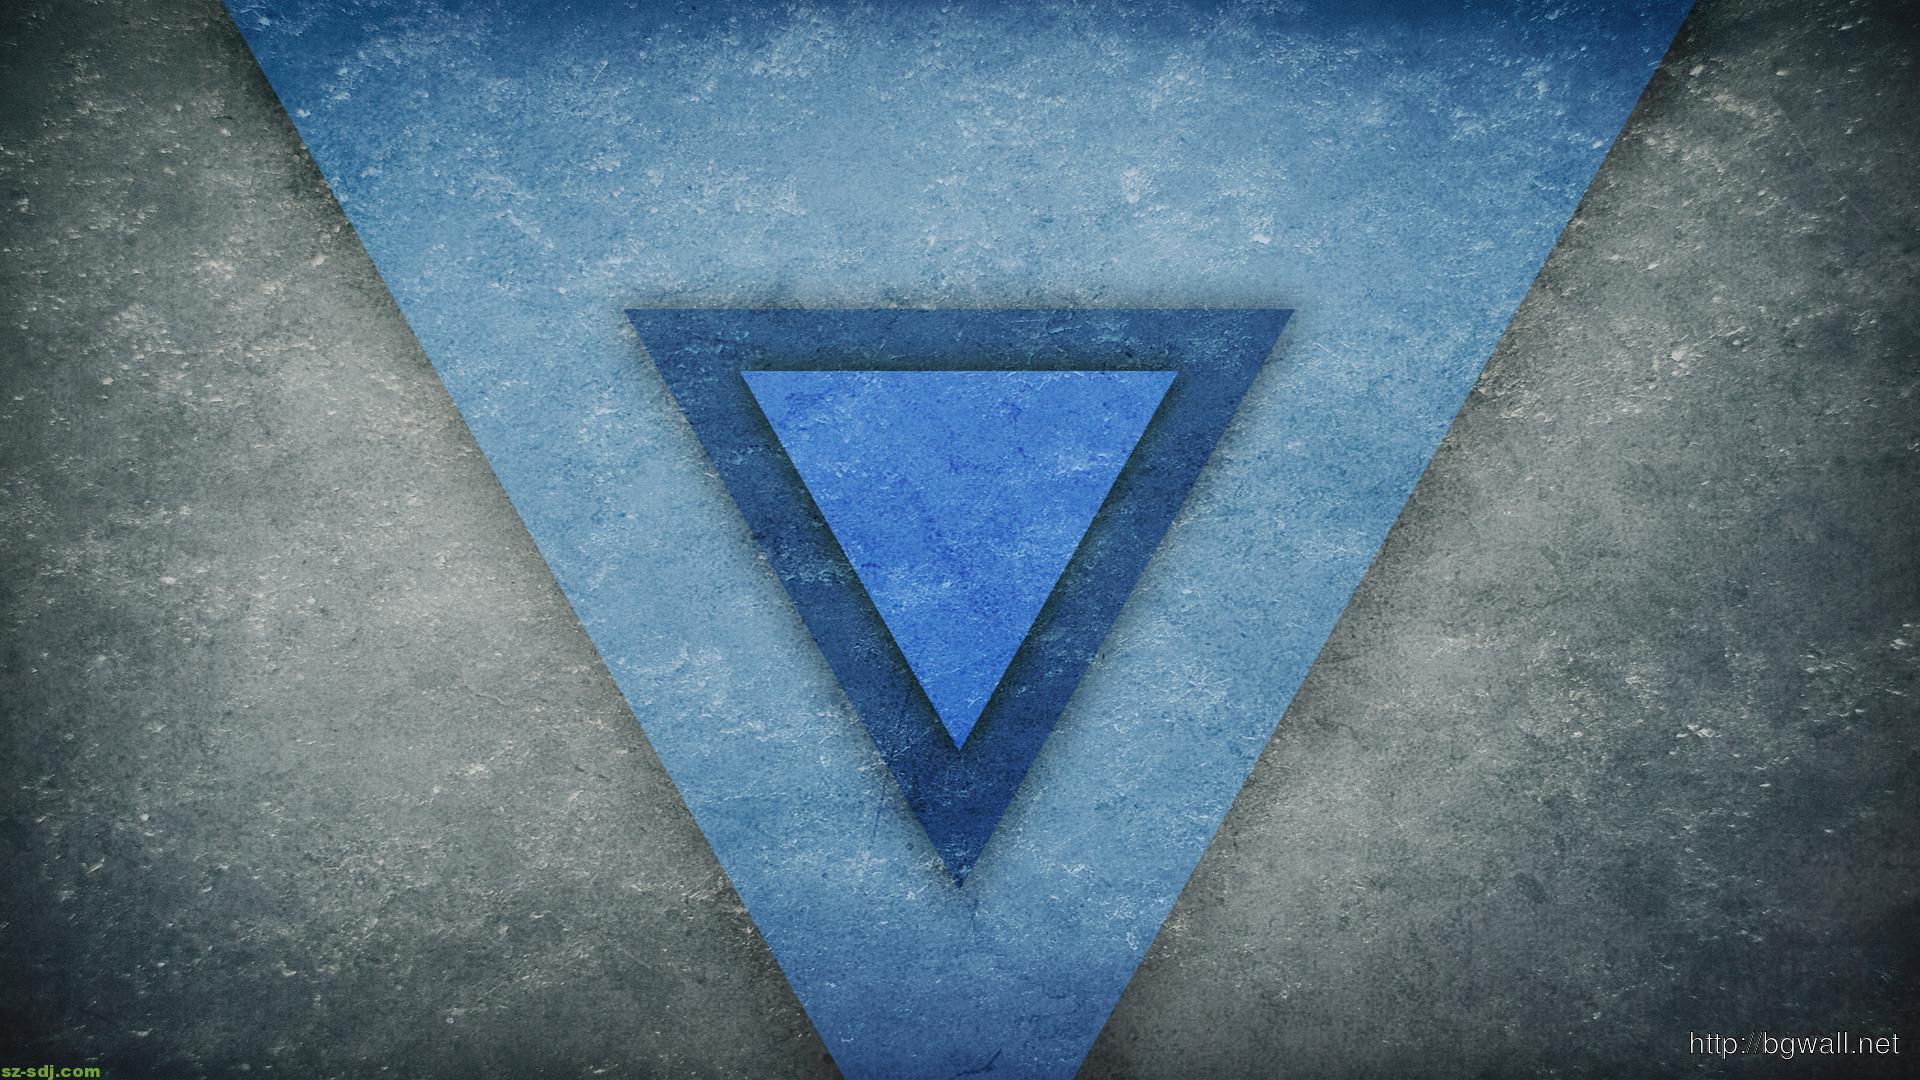 blue-art-triangle-wallpaper